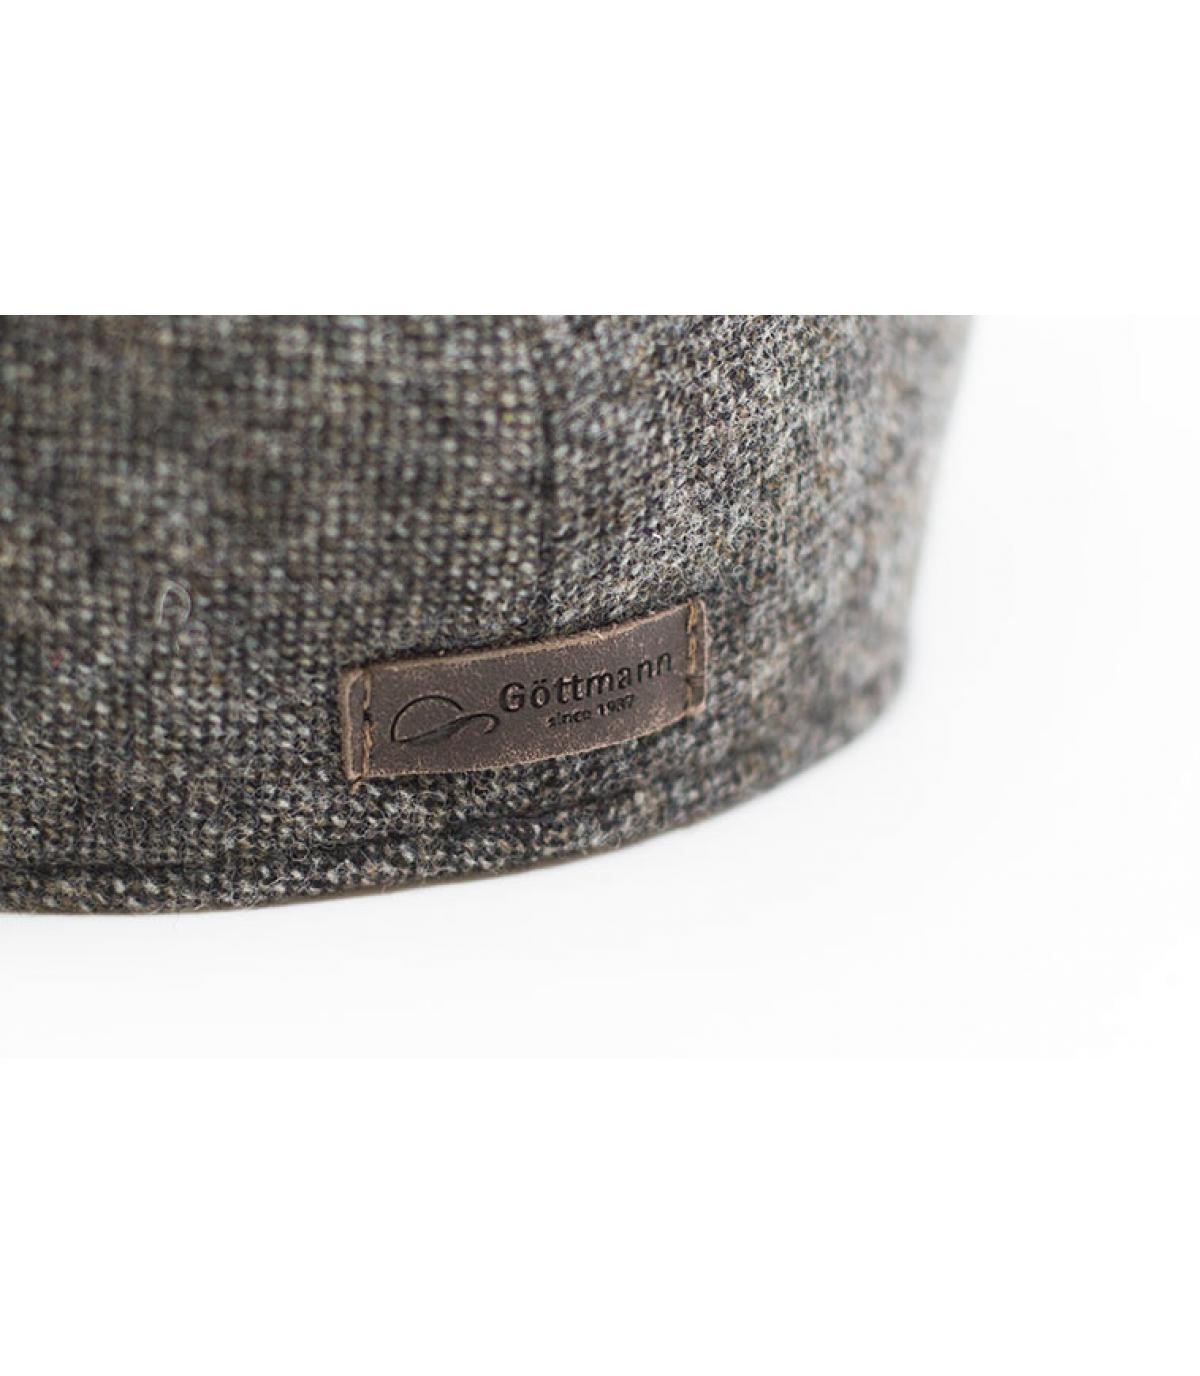 Detalles Oxford Wool brown imagen 3